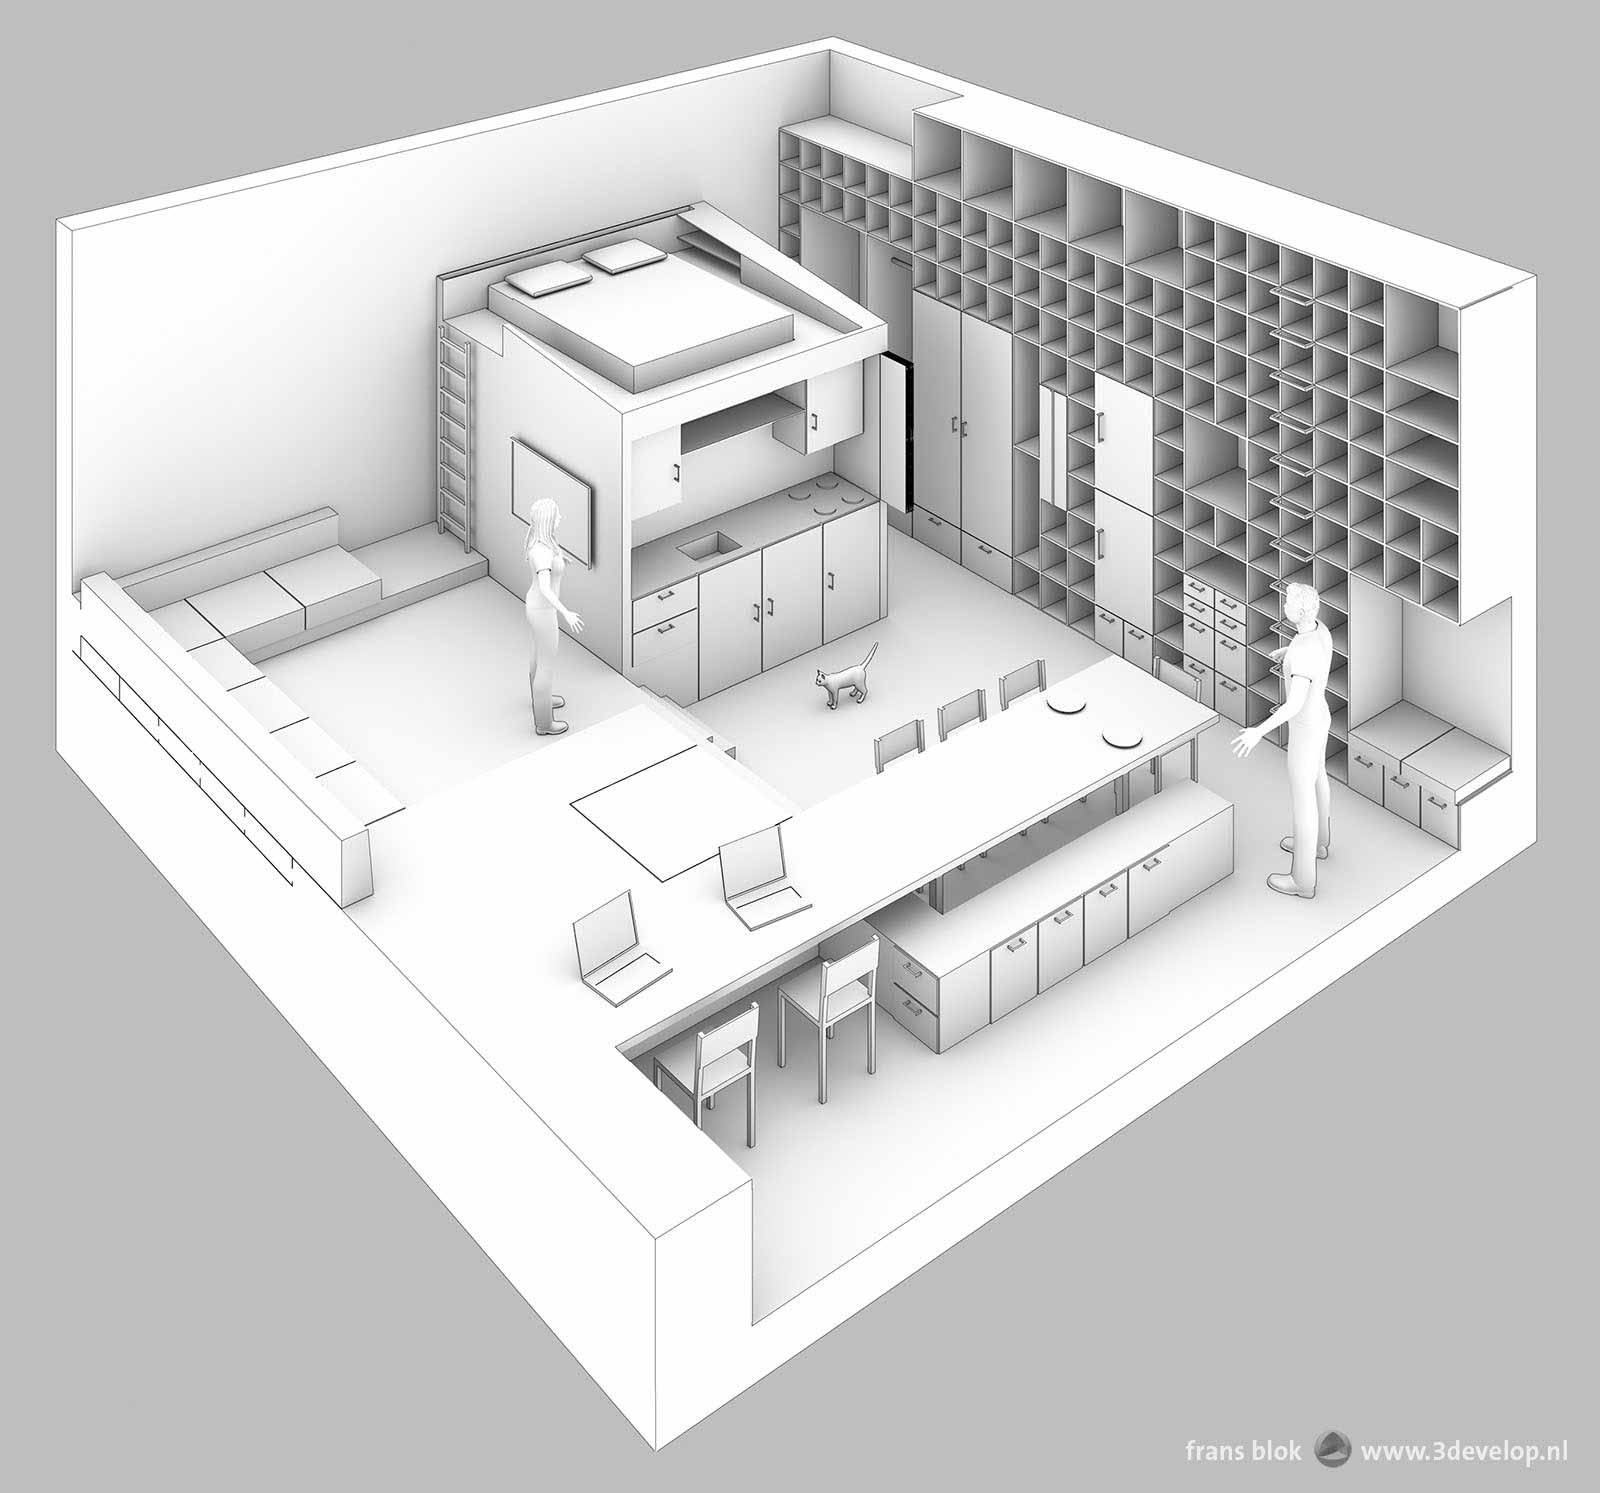 Axonometric artist impression of a condo, a compact urban appartment.